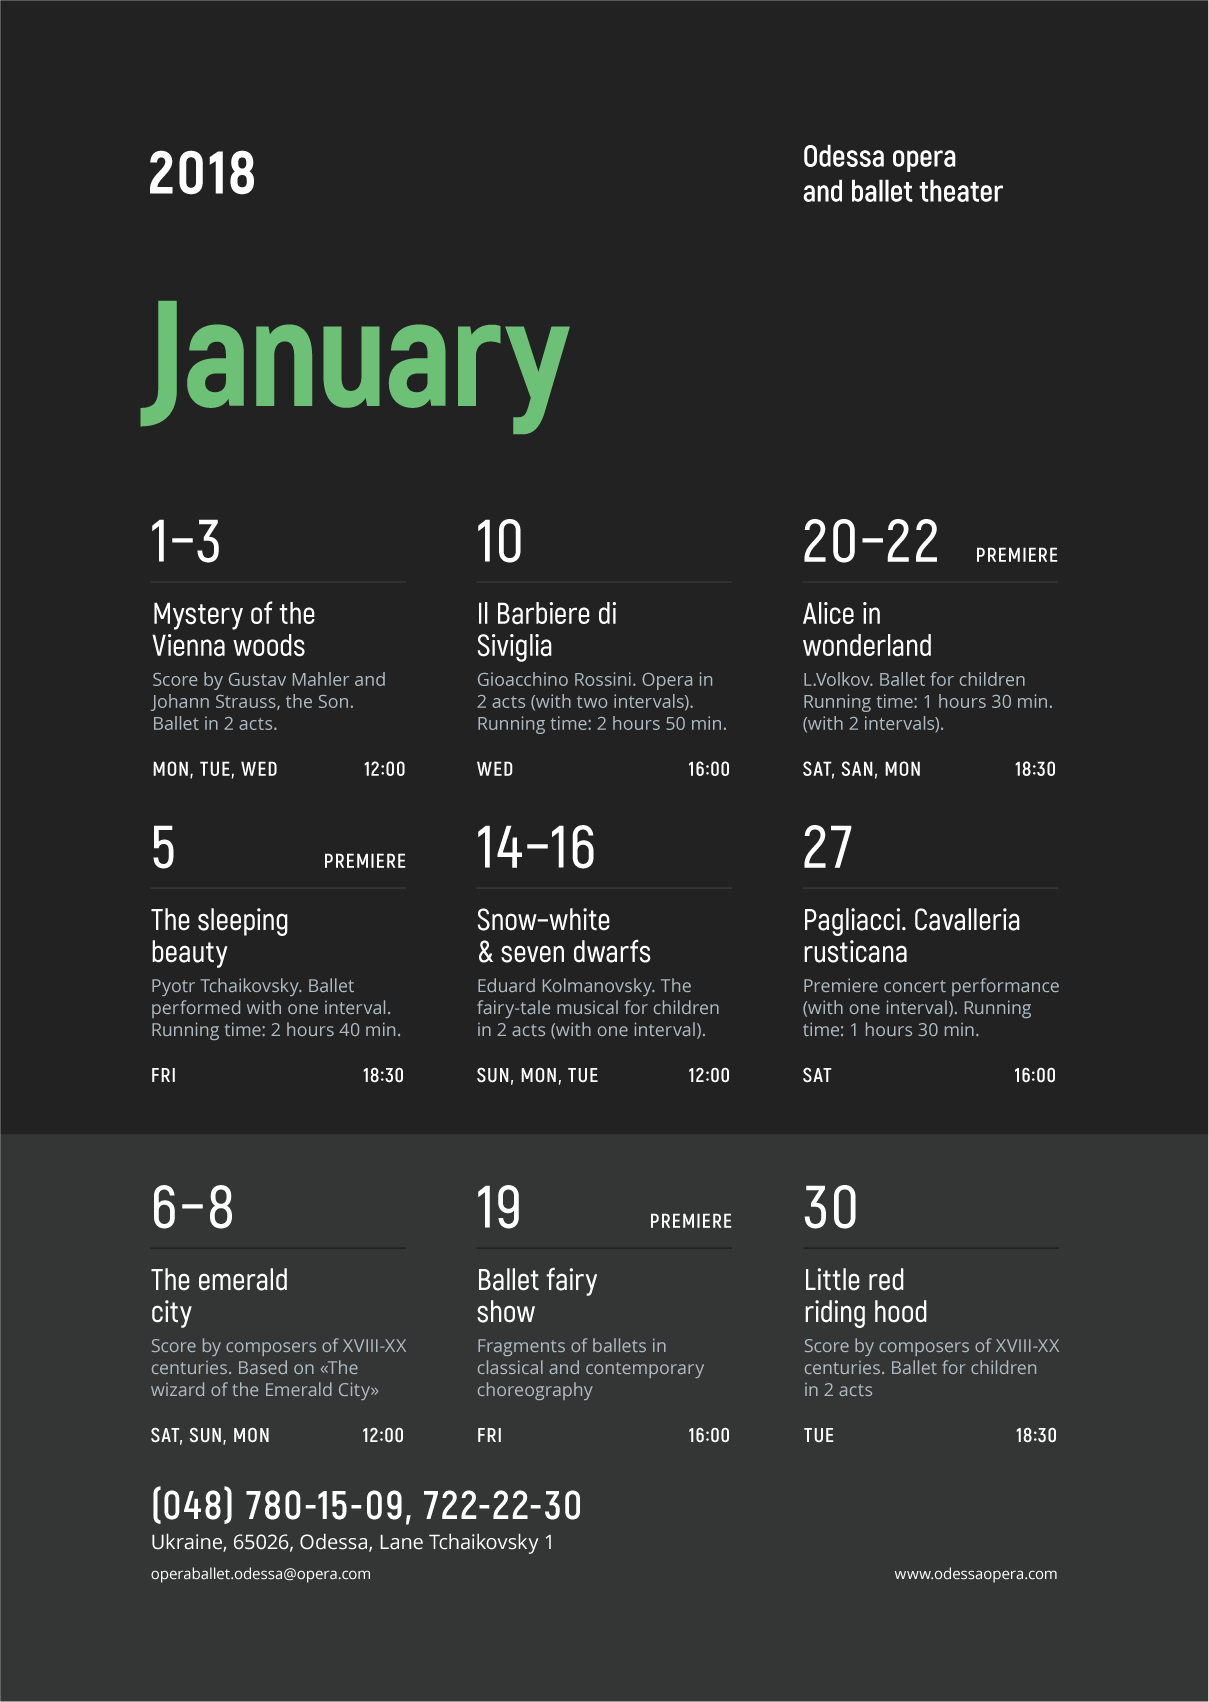 Schedule Event Poster Vol 4 Events Calendar Design Schedule Design Layout Event Schedule Design